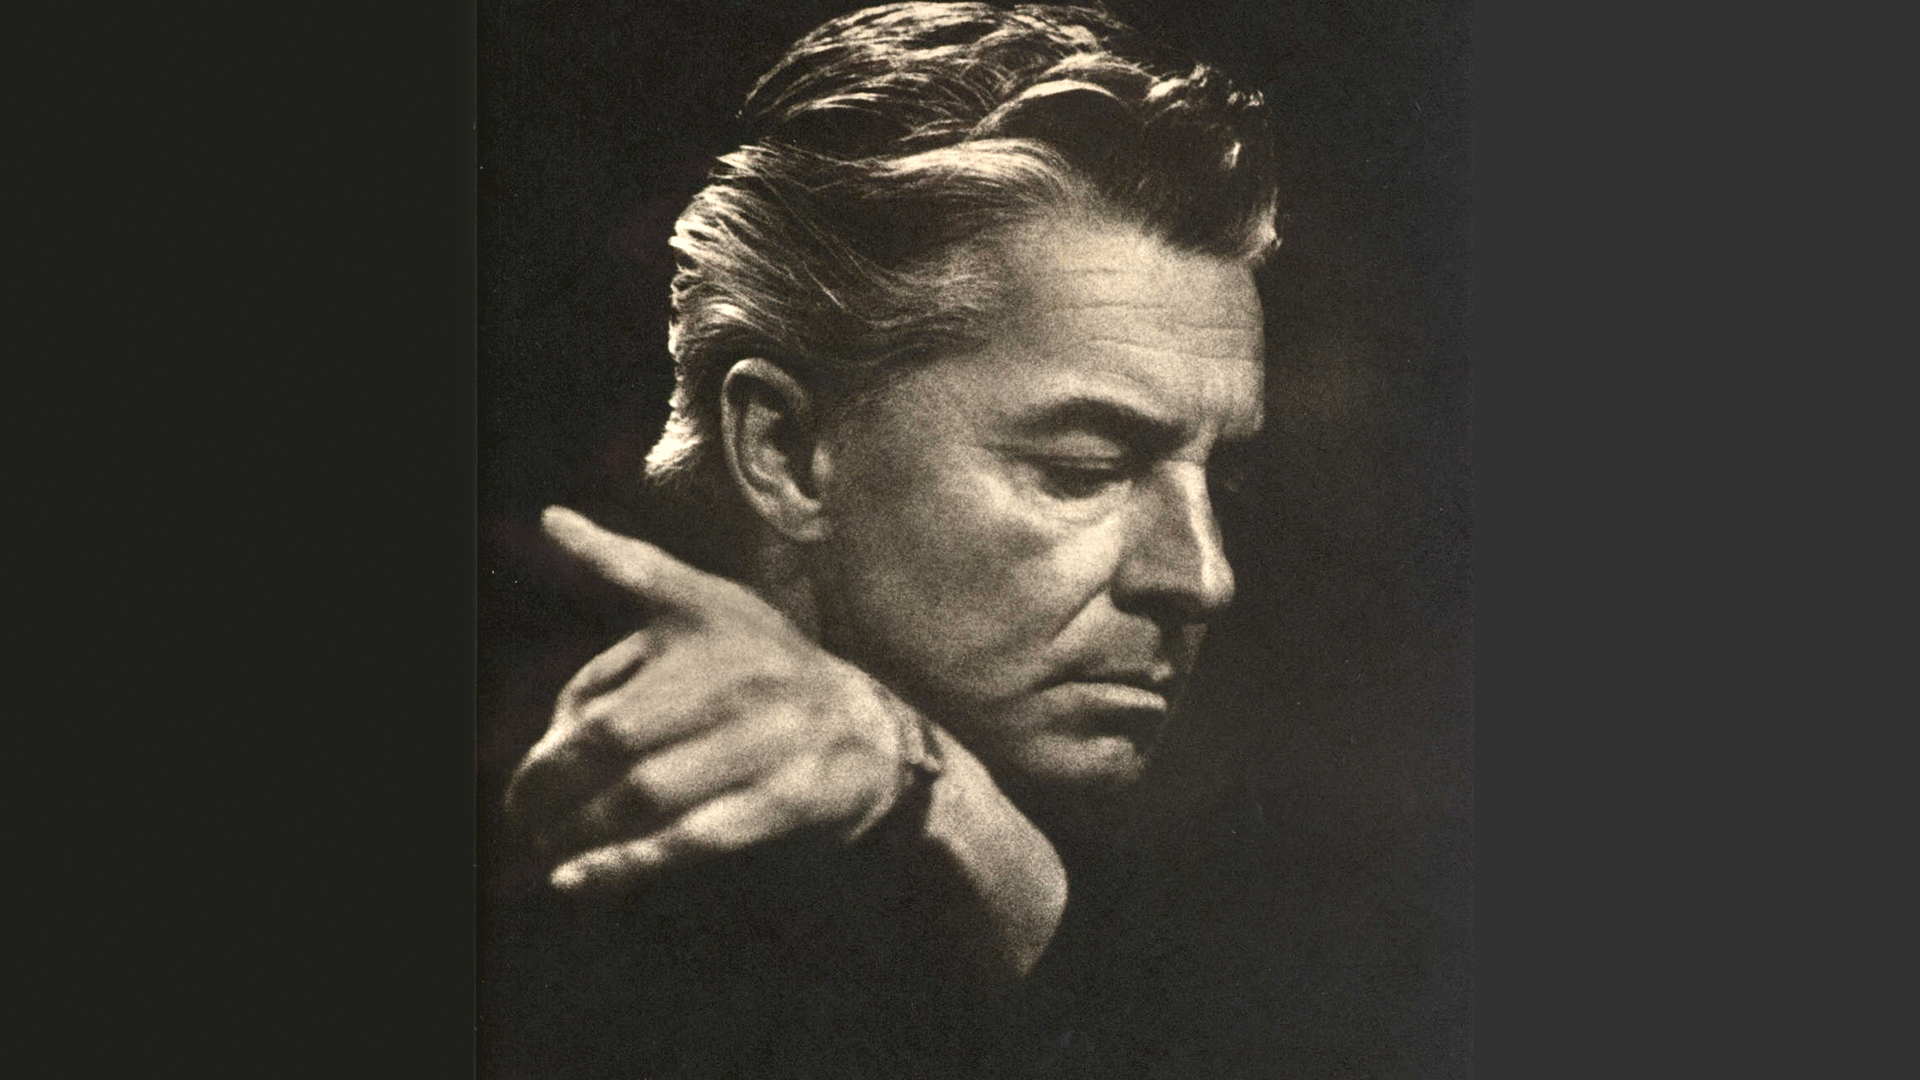 Herbert von Karajan conducts Brahms' Symphony No. 1